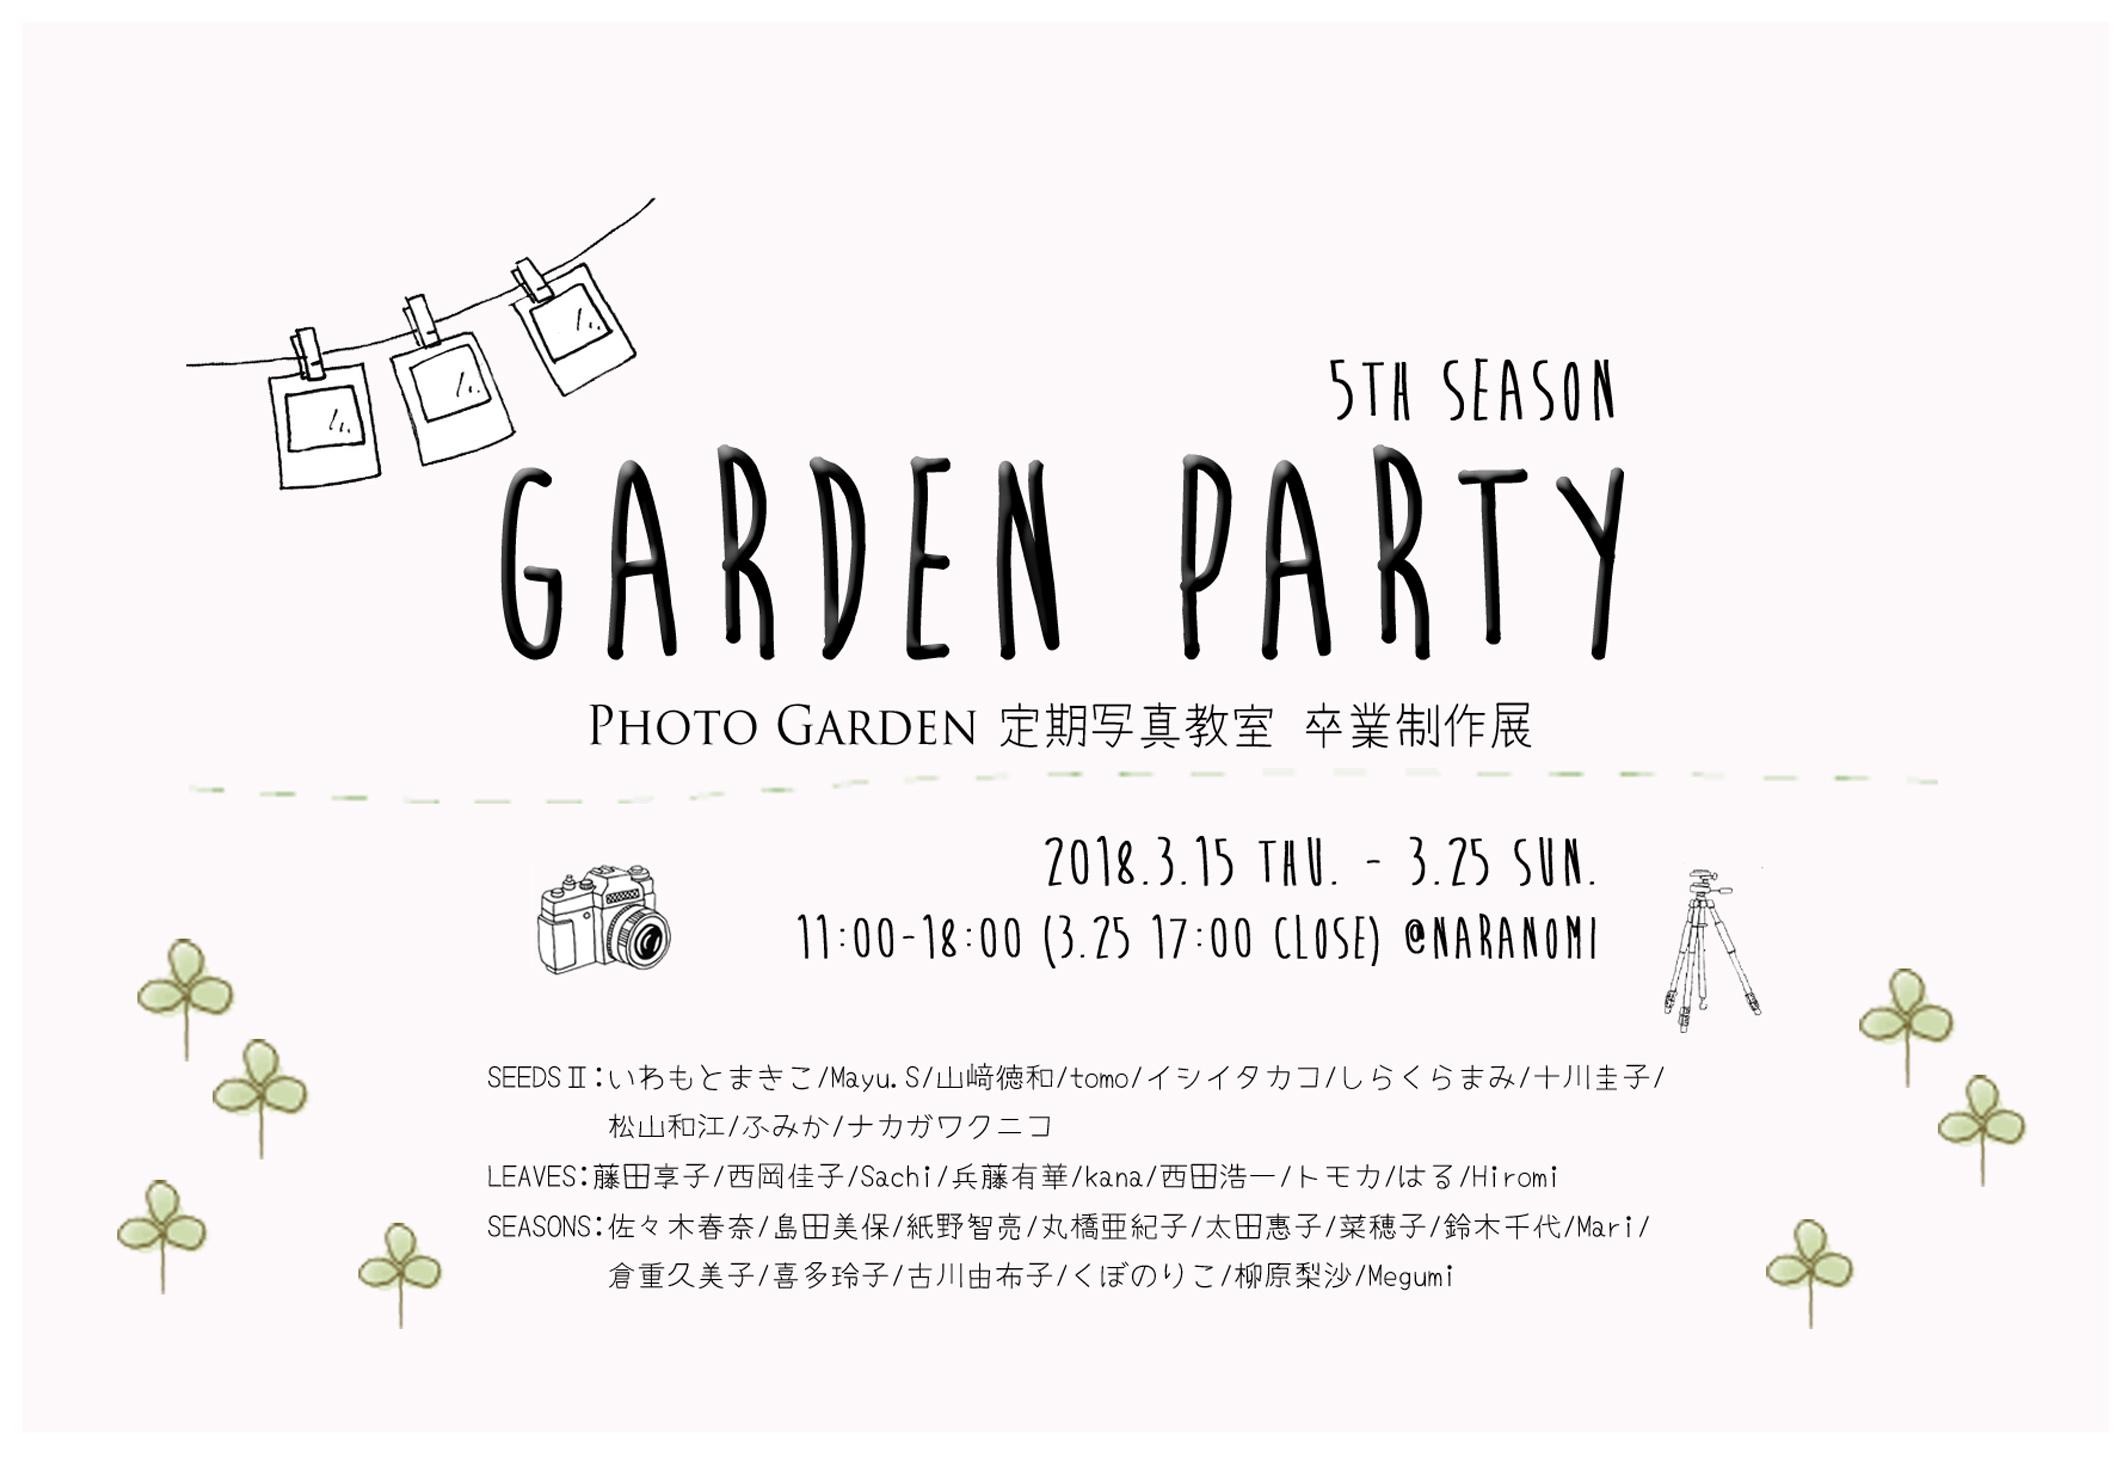 PHOTO GARDEN定期写真教室 卒業制作展「Garden Party 5th season」最終日